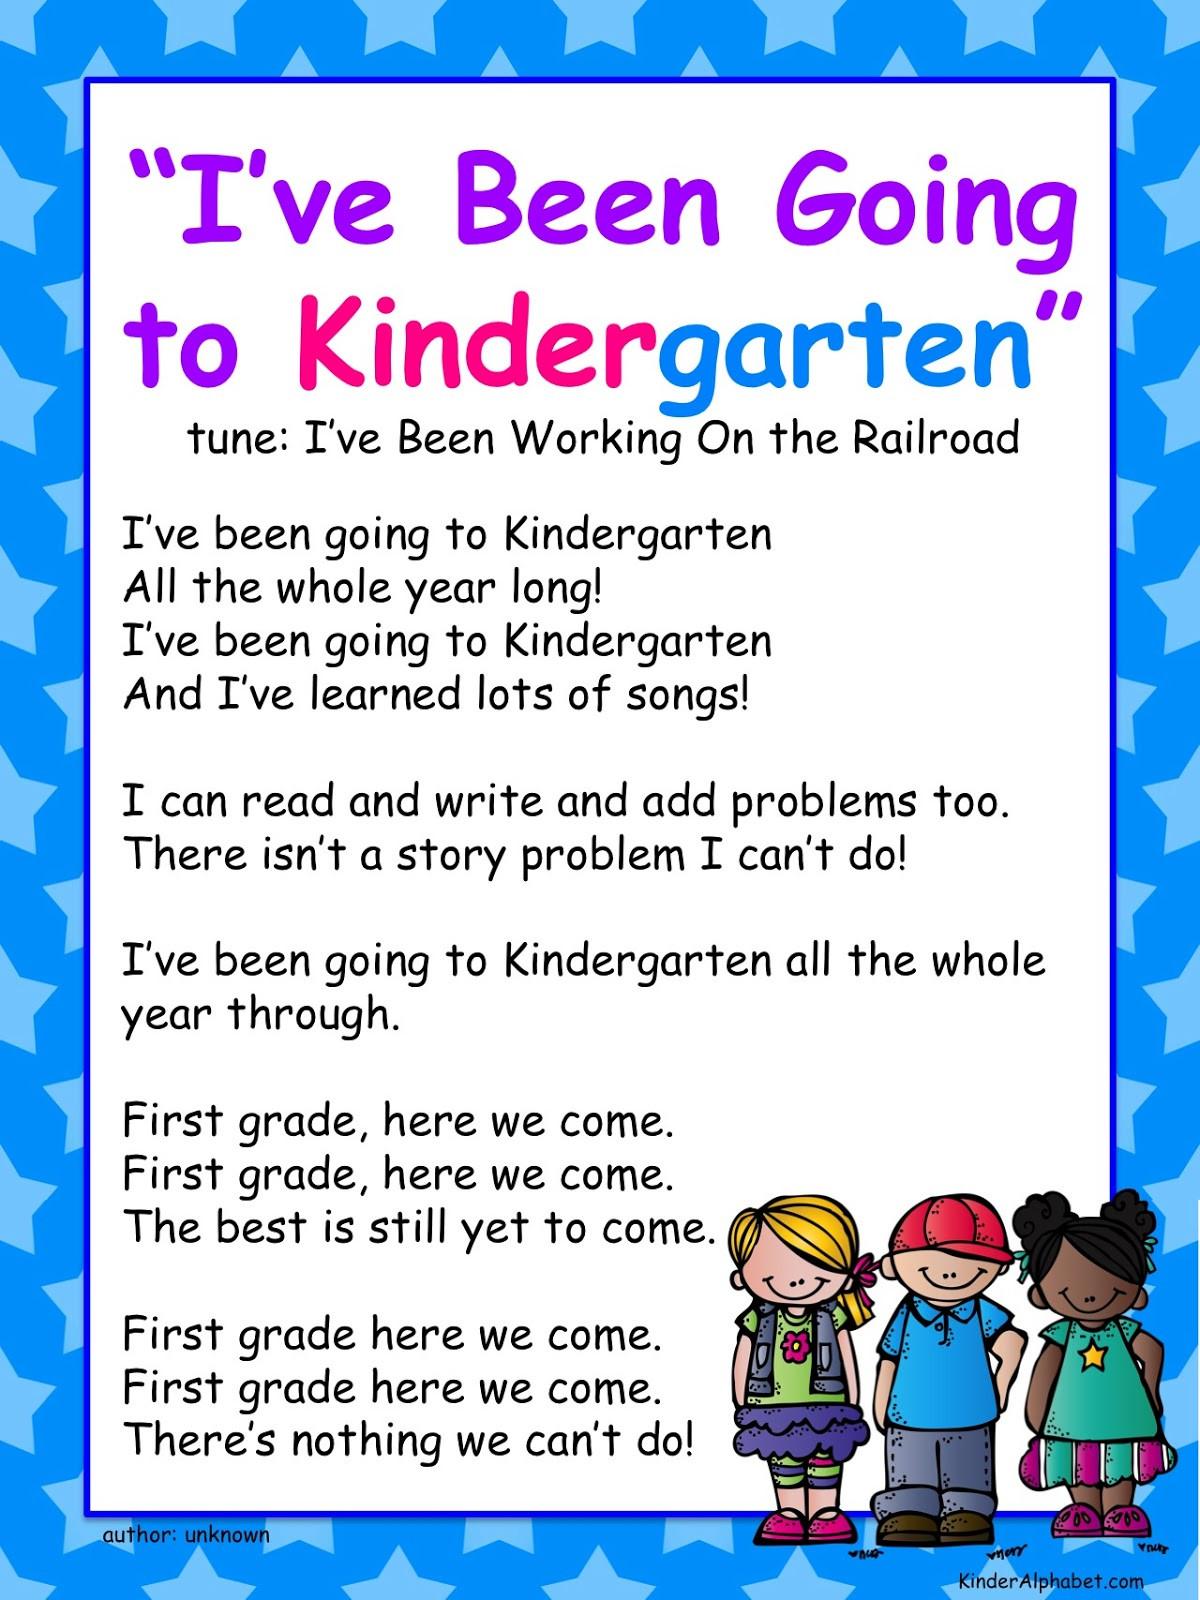 Preschool Graduation Quote  Quotes About Preschool Graduation QuotesGram